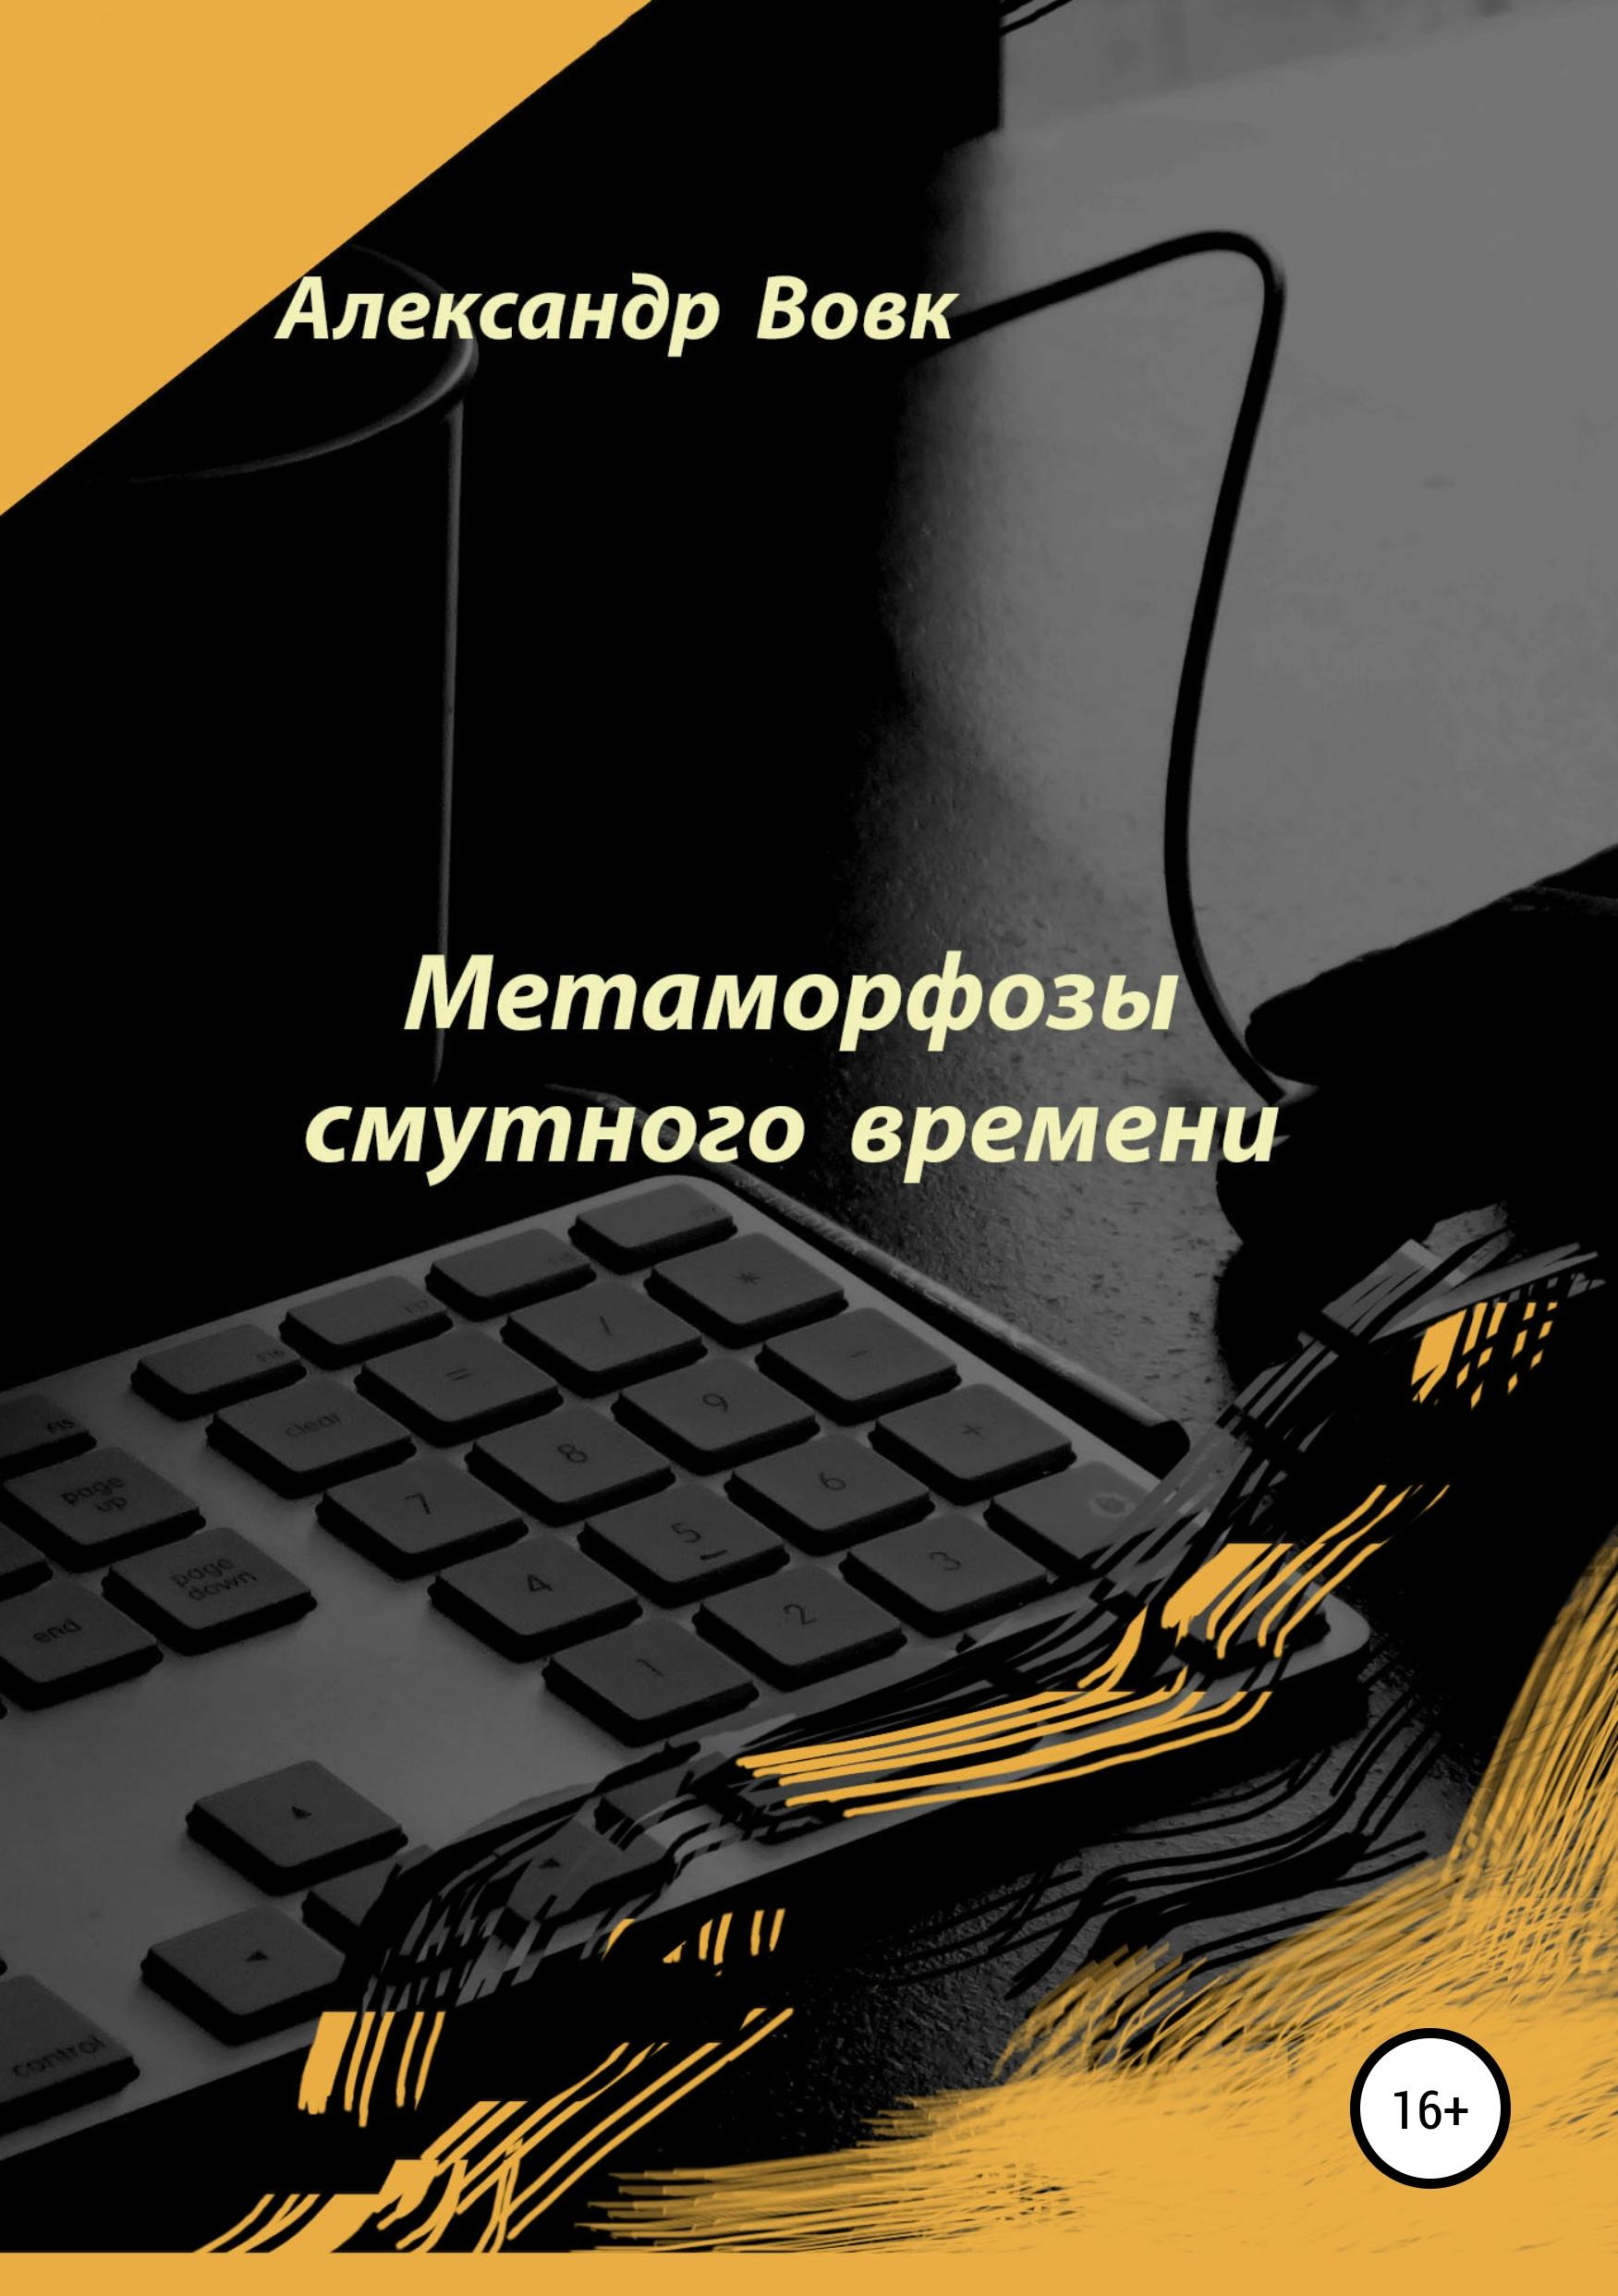 Обложка книги. Автор - Александр Вовк